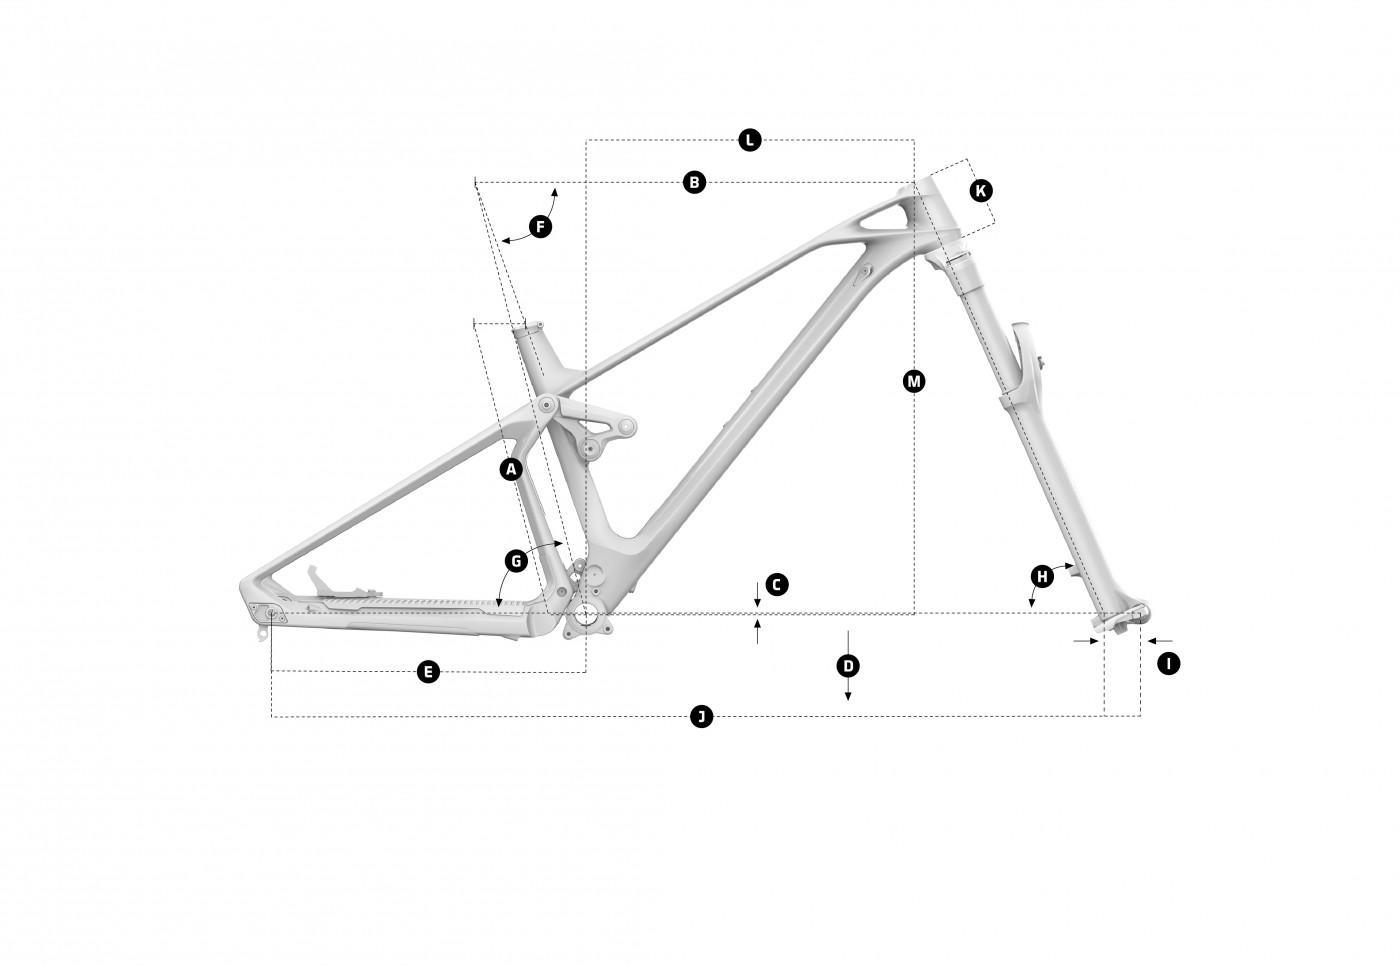 Geometria roweru Mondraker SuperFoxy